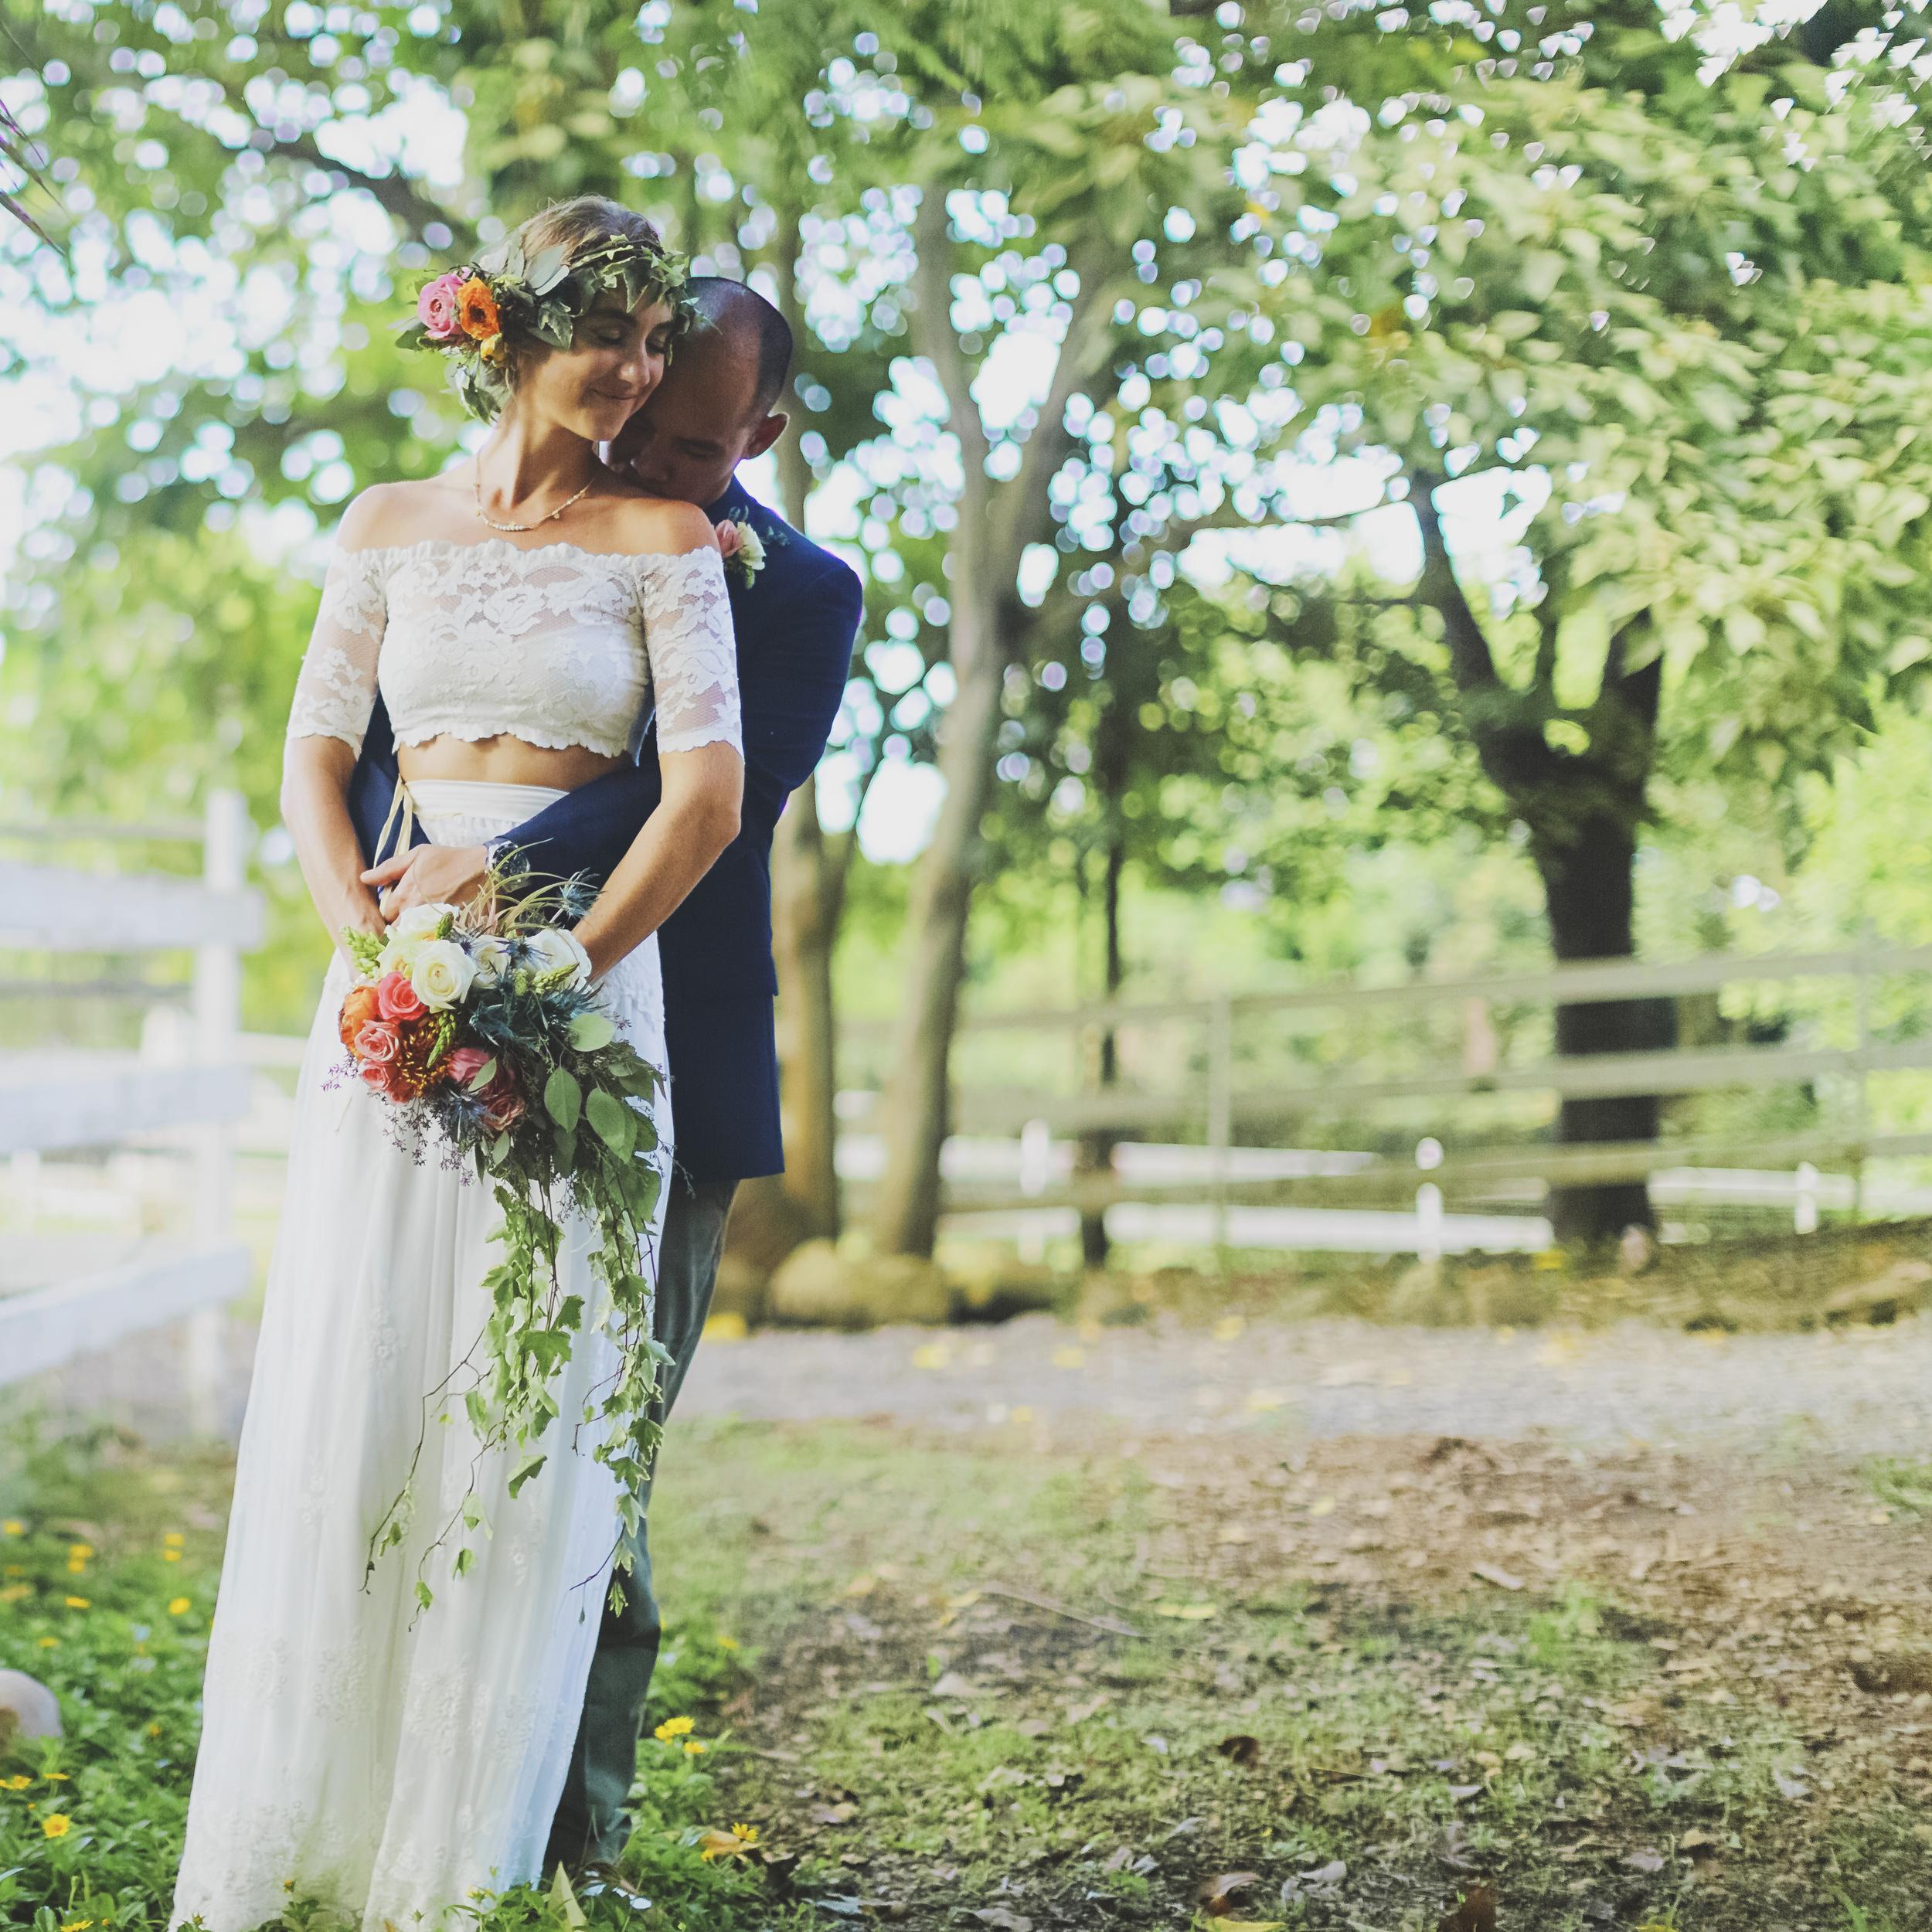 angie-diaz-photography-oahu-hawaii-wedding-tradewinds-ranch-85.jpg